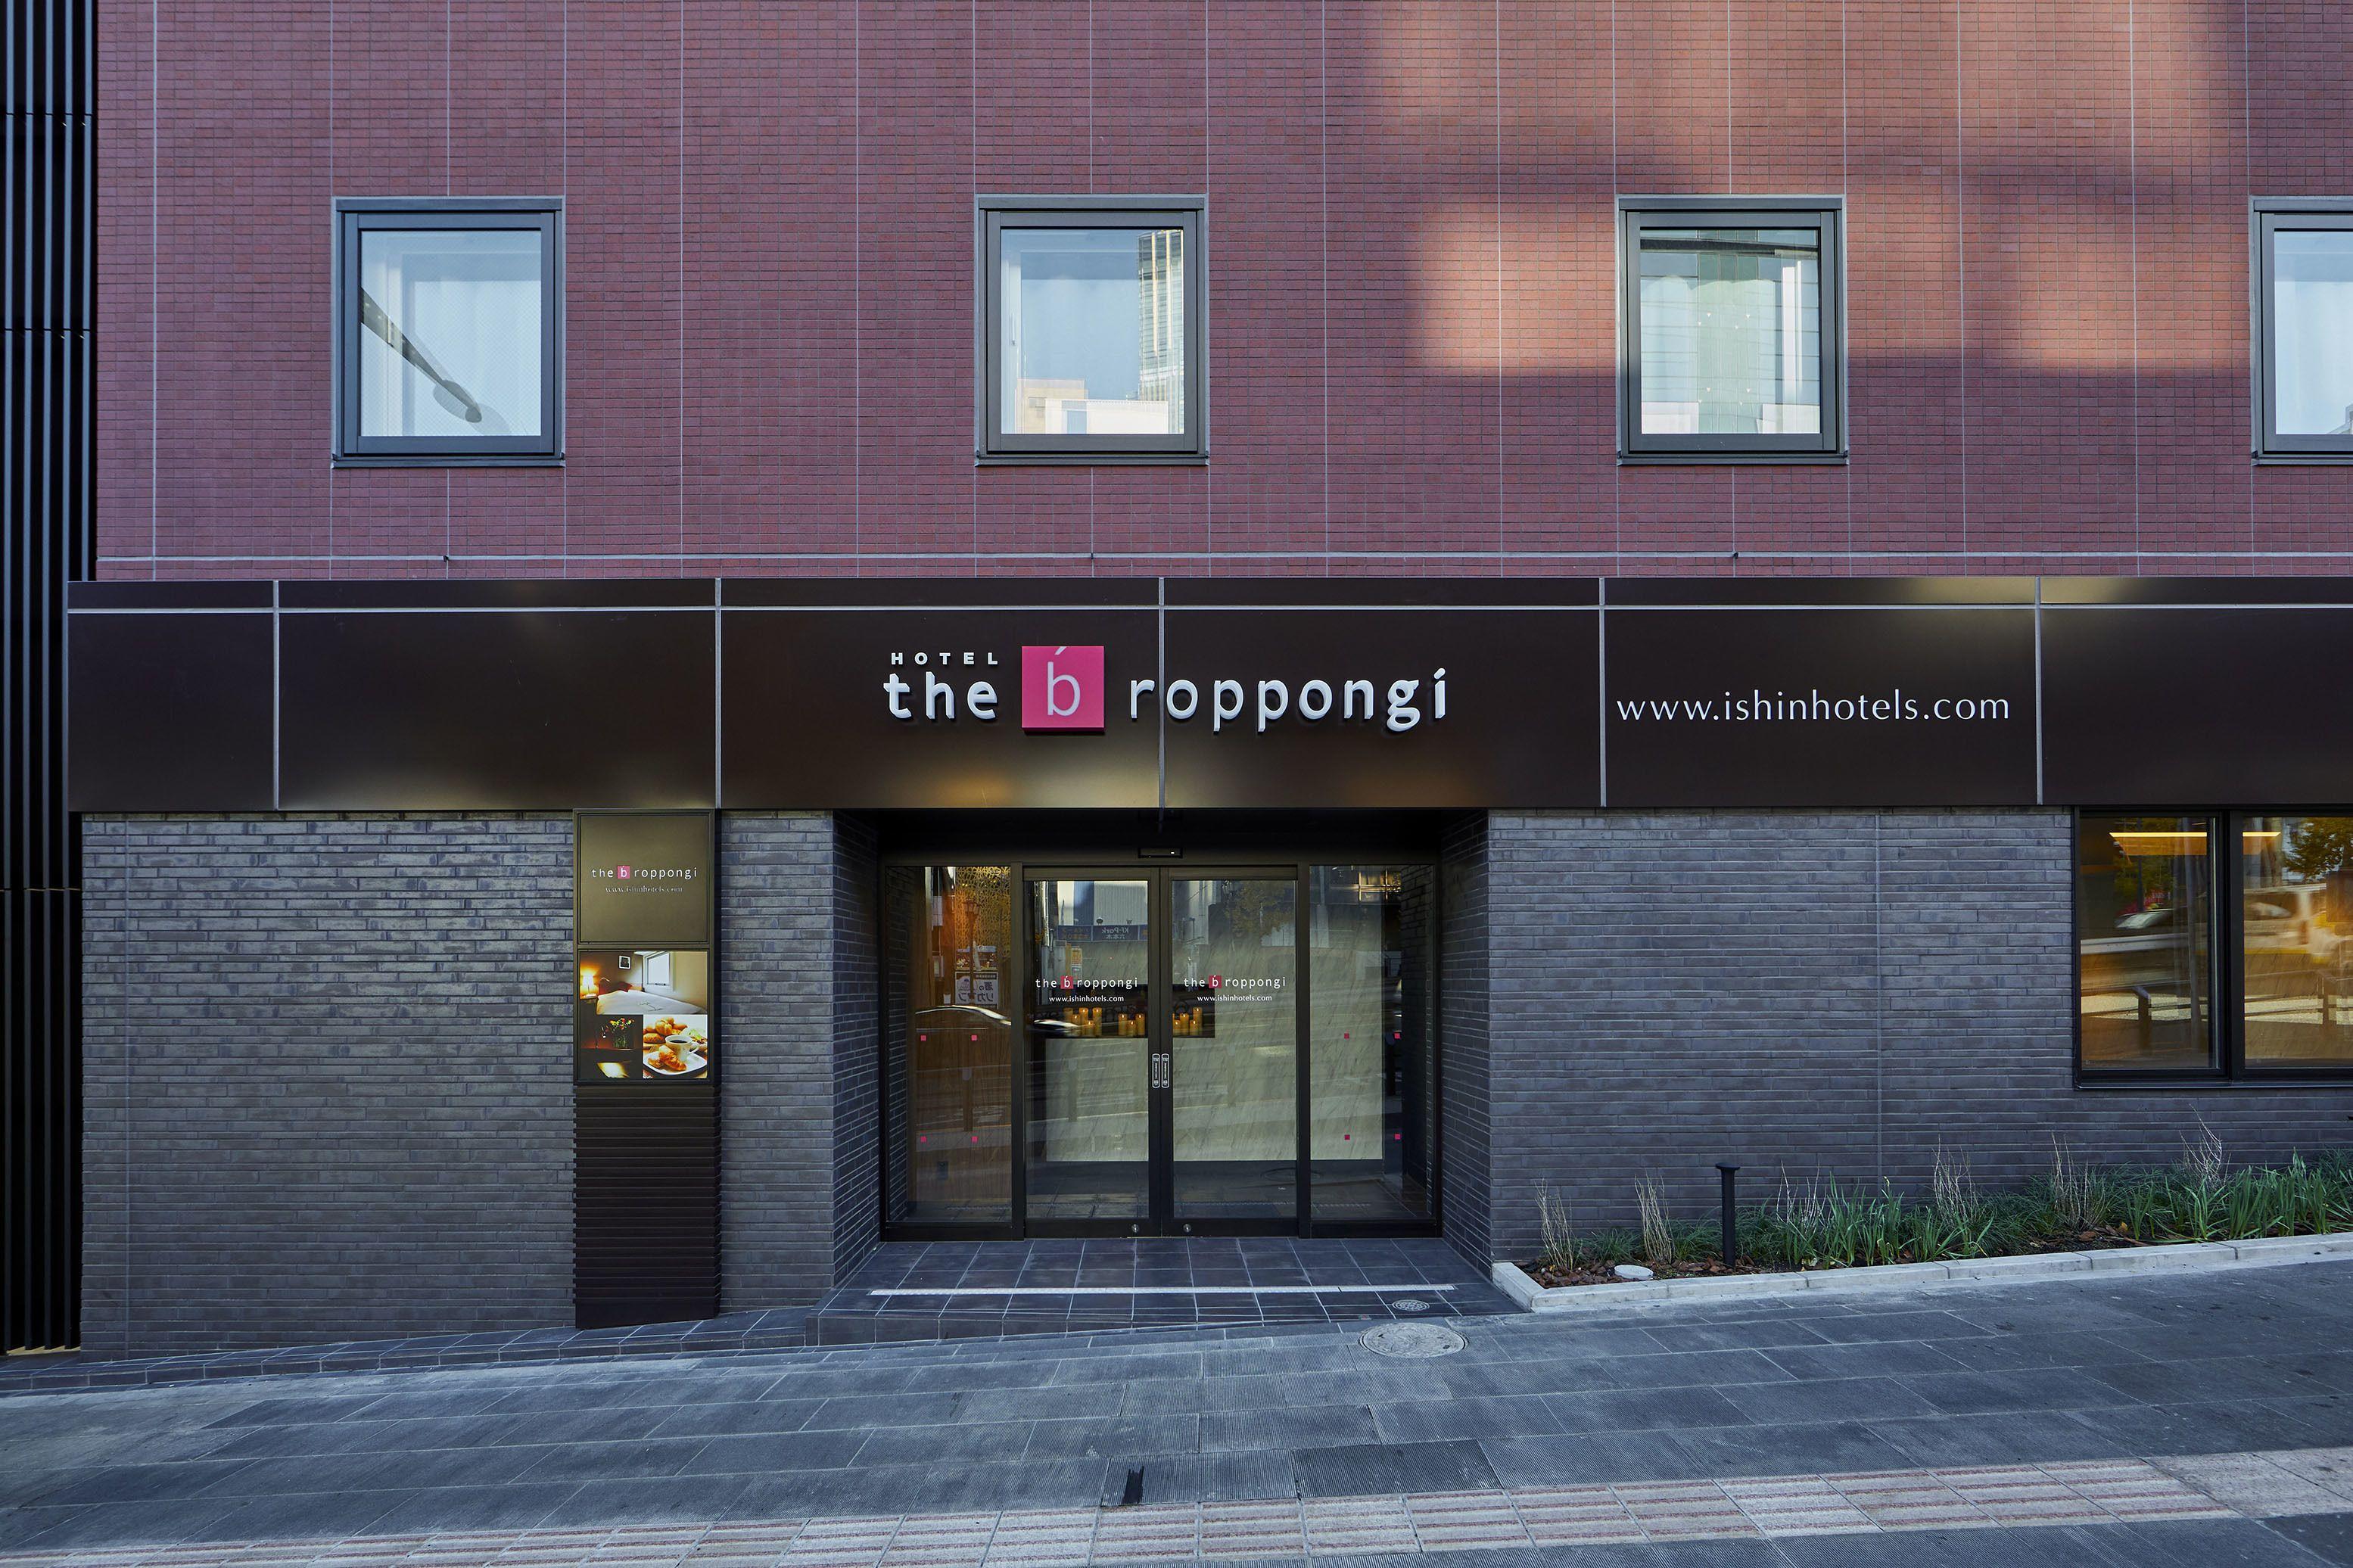 The B Roppongi